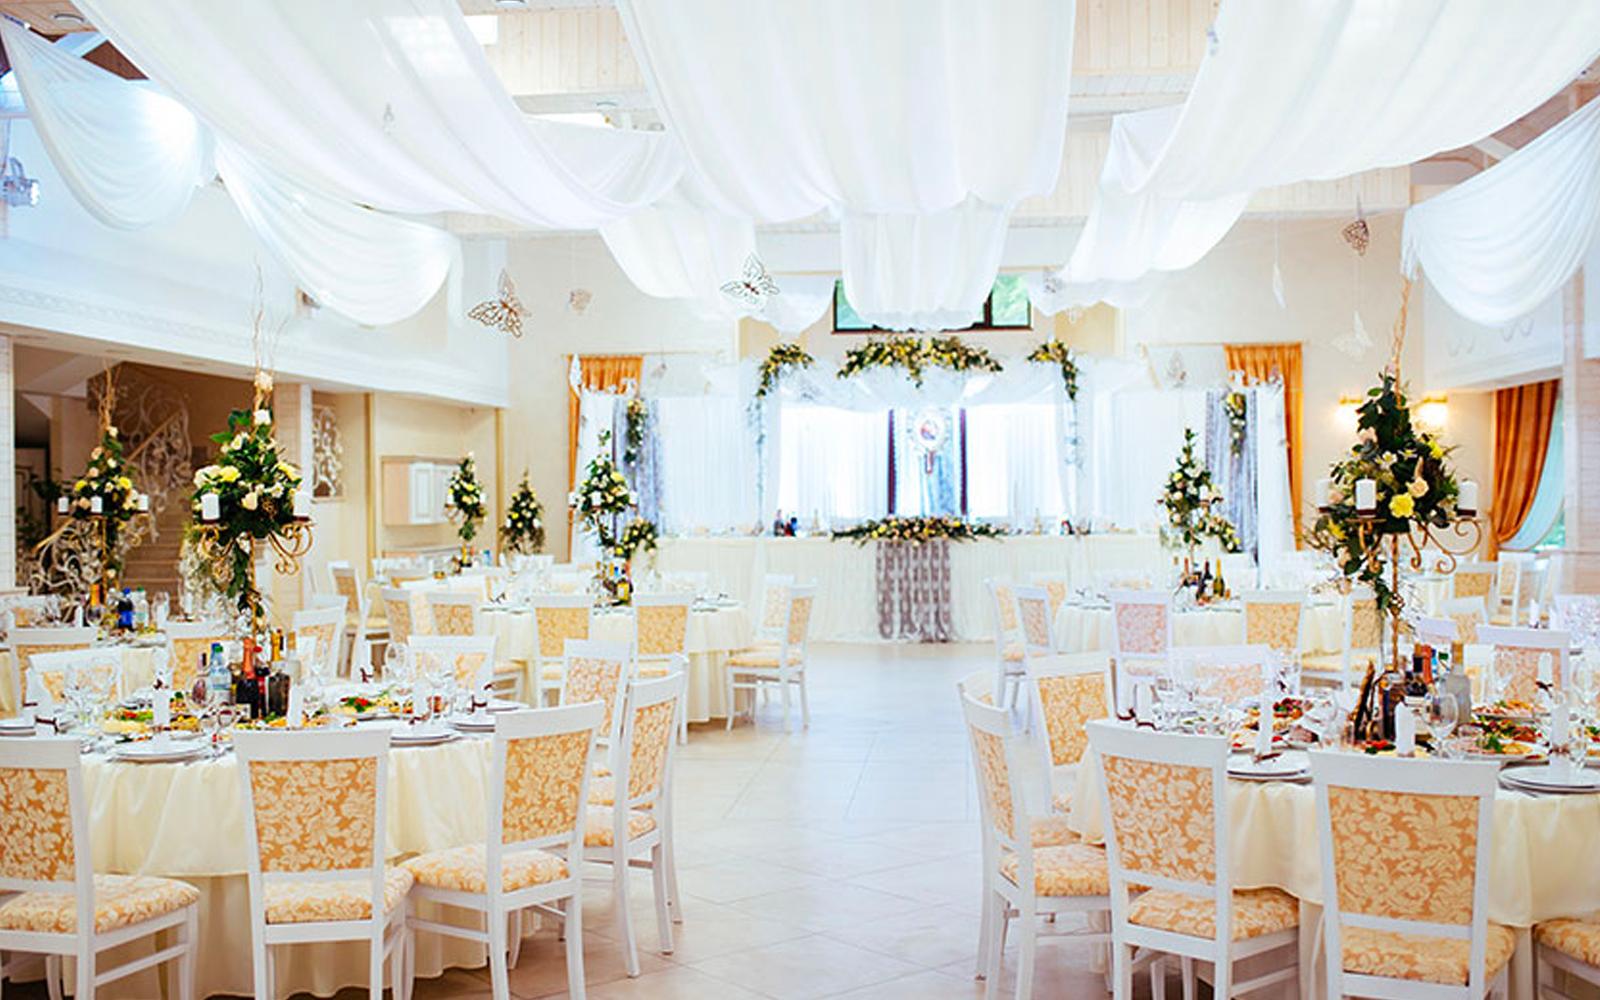 Best-Wedding-Caterer-On-Long-Island